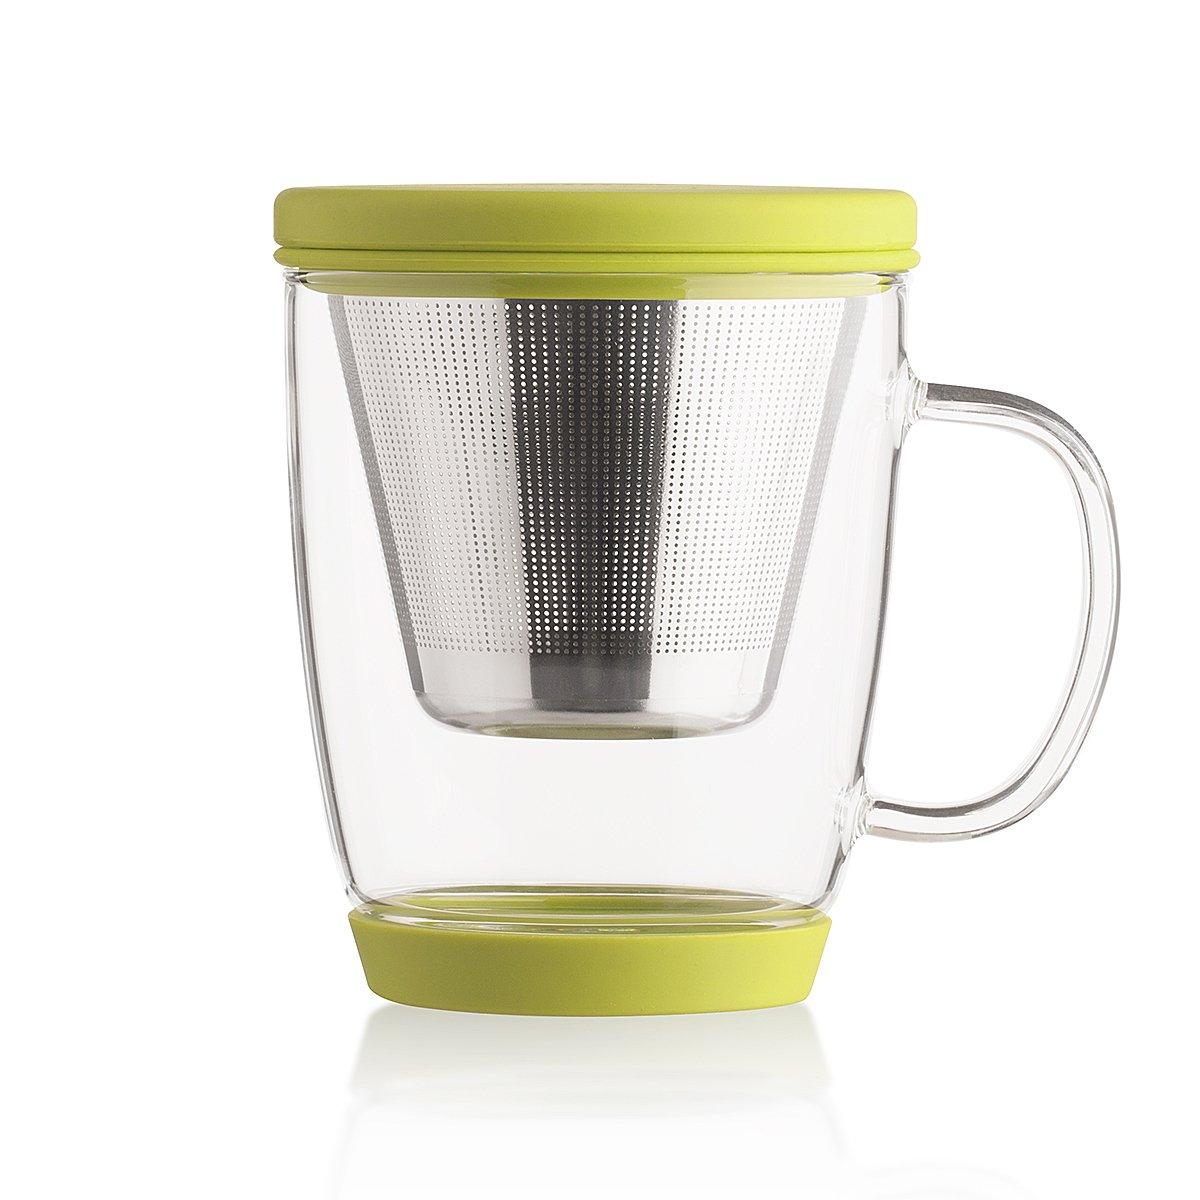 Emoi 16oz Teapot, Glass Brewing Tea Cup, Tea Infuser Mug, Loose Leaf Flower Tea Maker w/Strainer, Food Grade Silicone Lid&Base, Heat Resistant, Noise Free, Safe&Healthy, Easy to Clean.(H1117G)